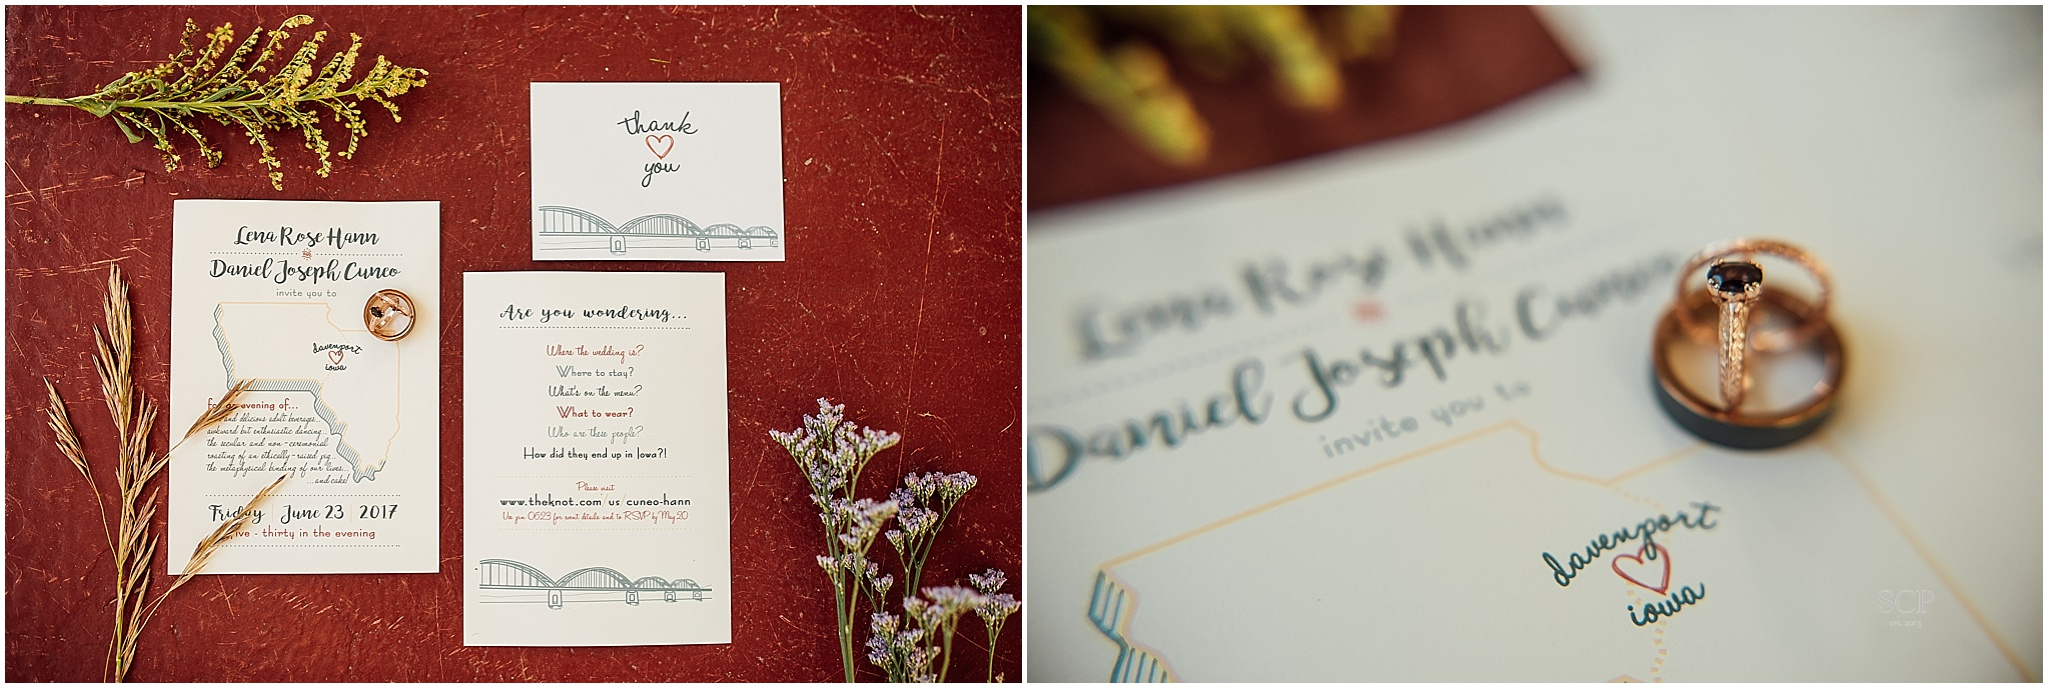 Credit Island Wedding | Lena & Dan — Scarlett Crews Photography